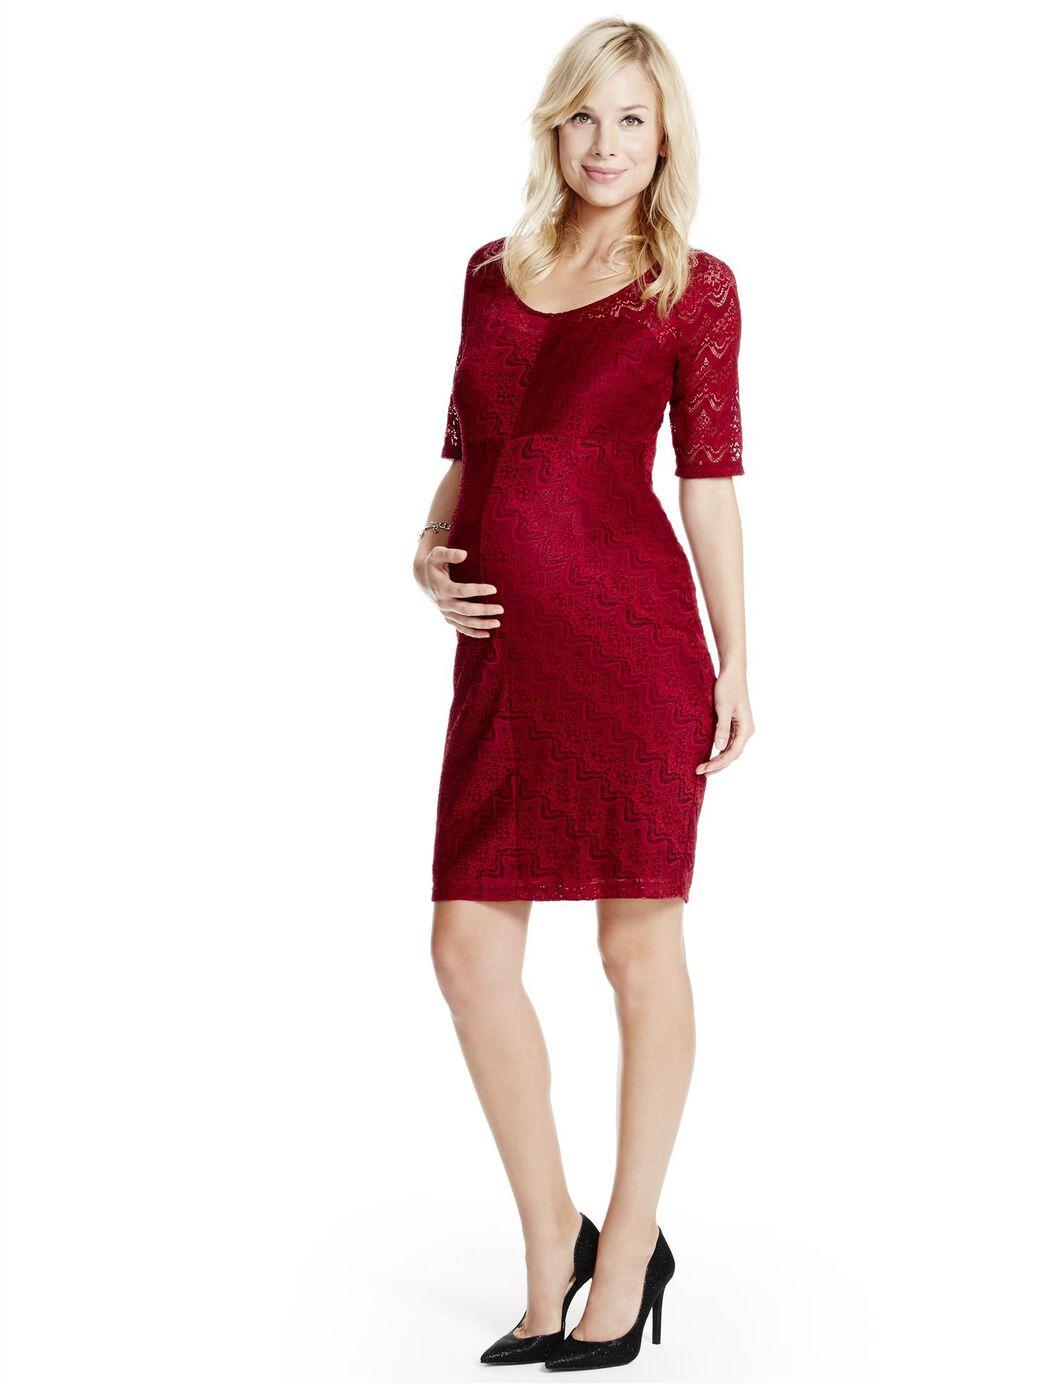 Jessica simpson lace maternity dress motherhood maternity jessica simpson lace maternity dress burgundy ombrellifo Gallery